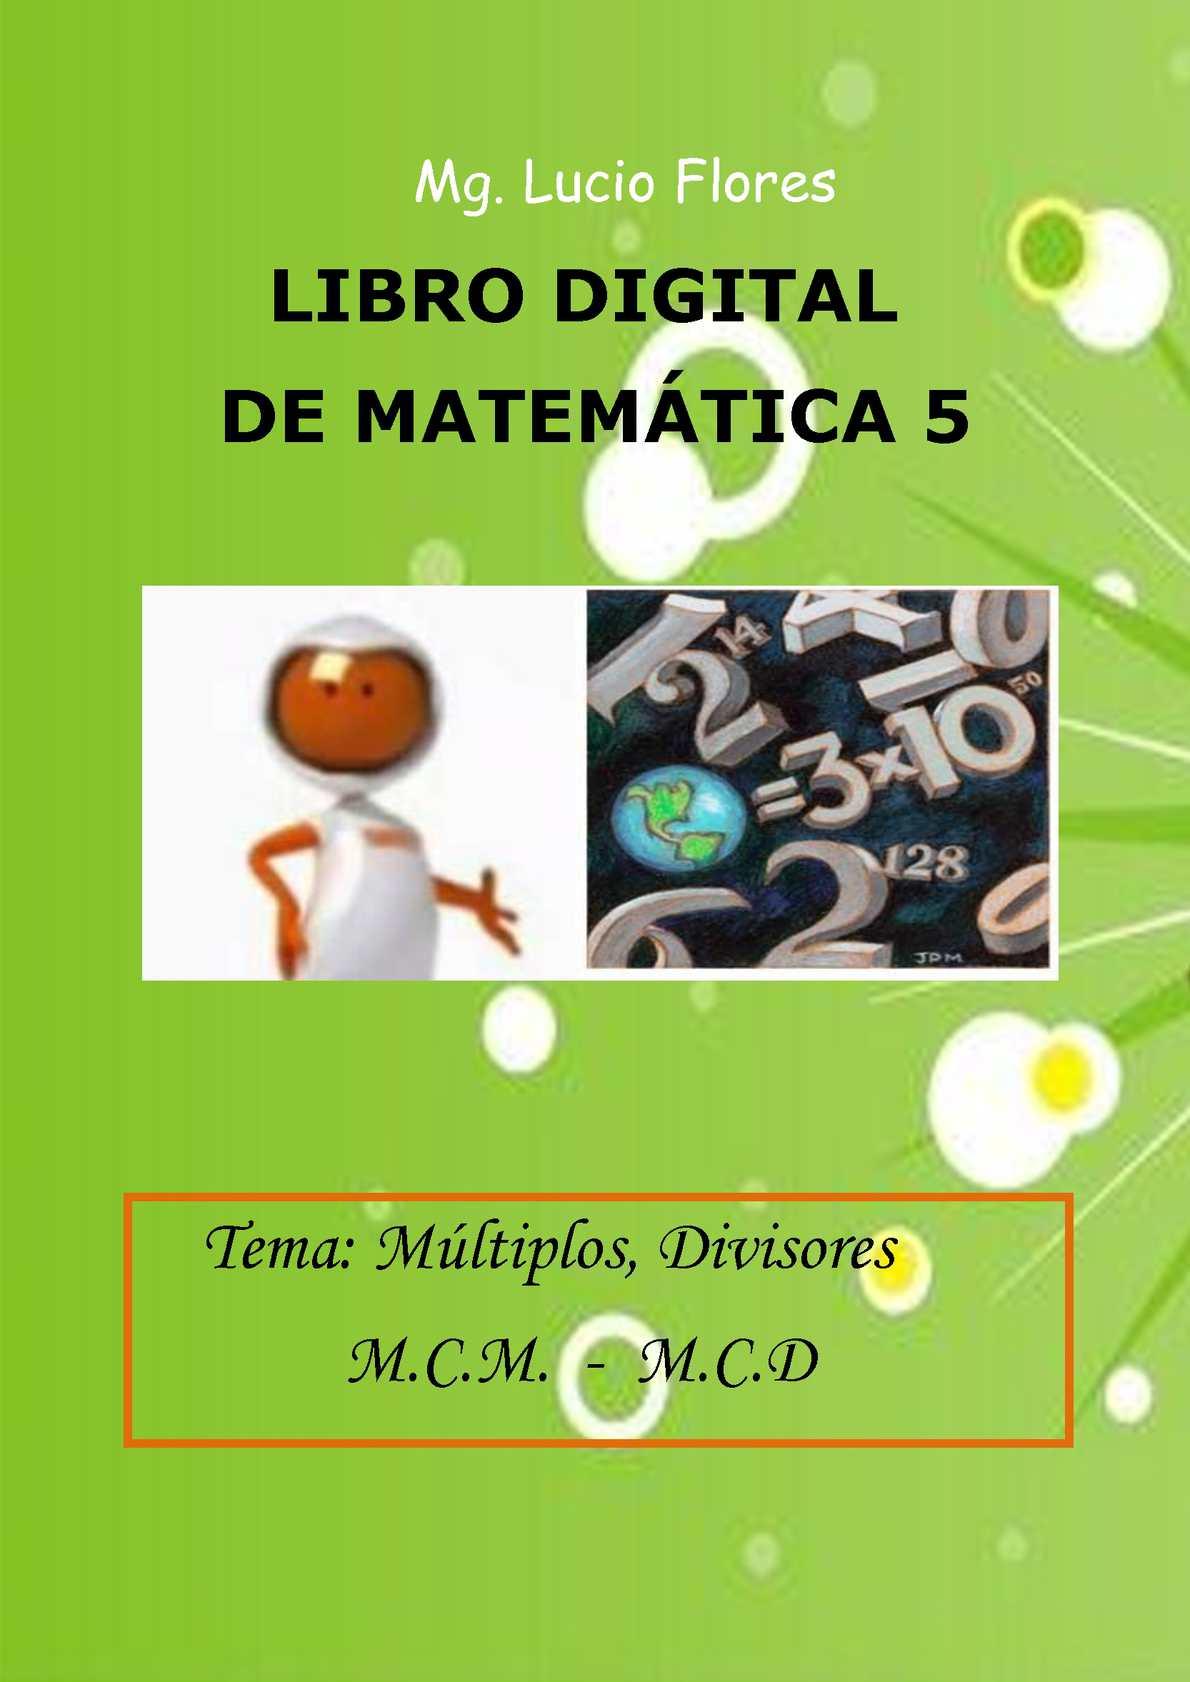 Libro Digital Lucio Flores Matemática 5 parte 3